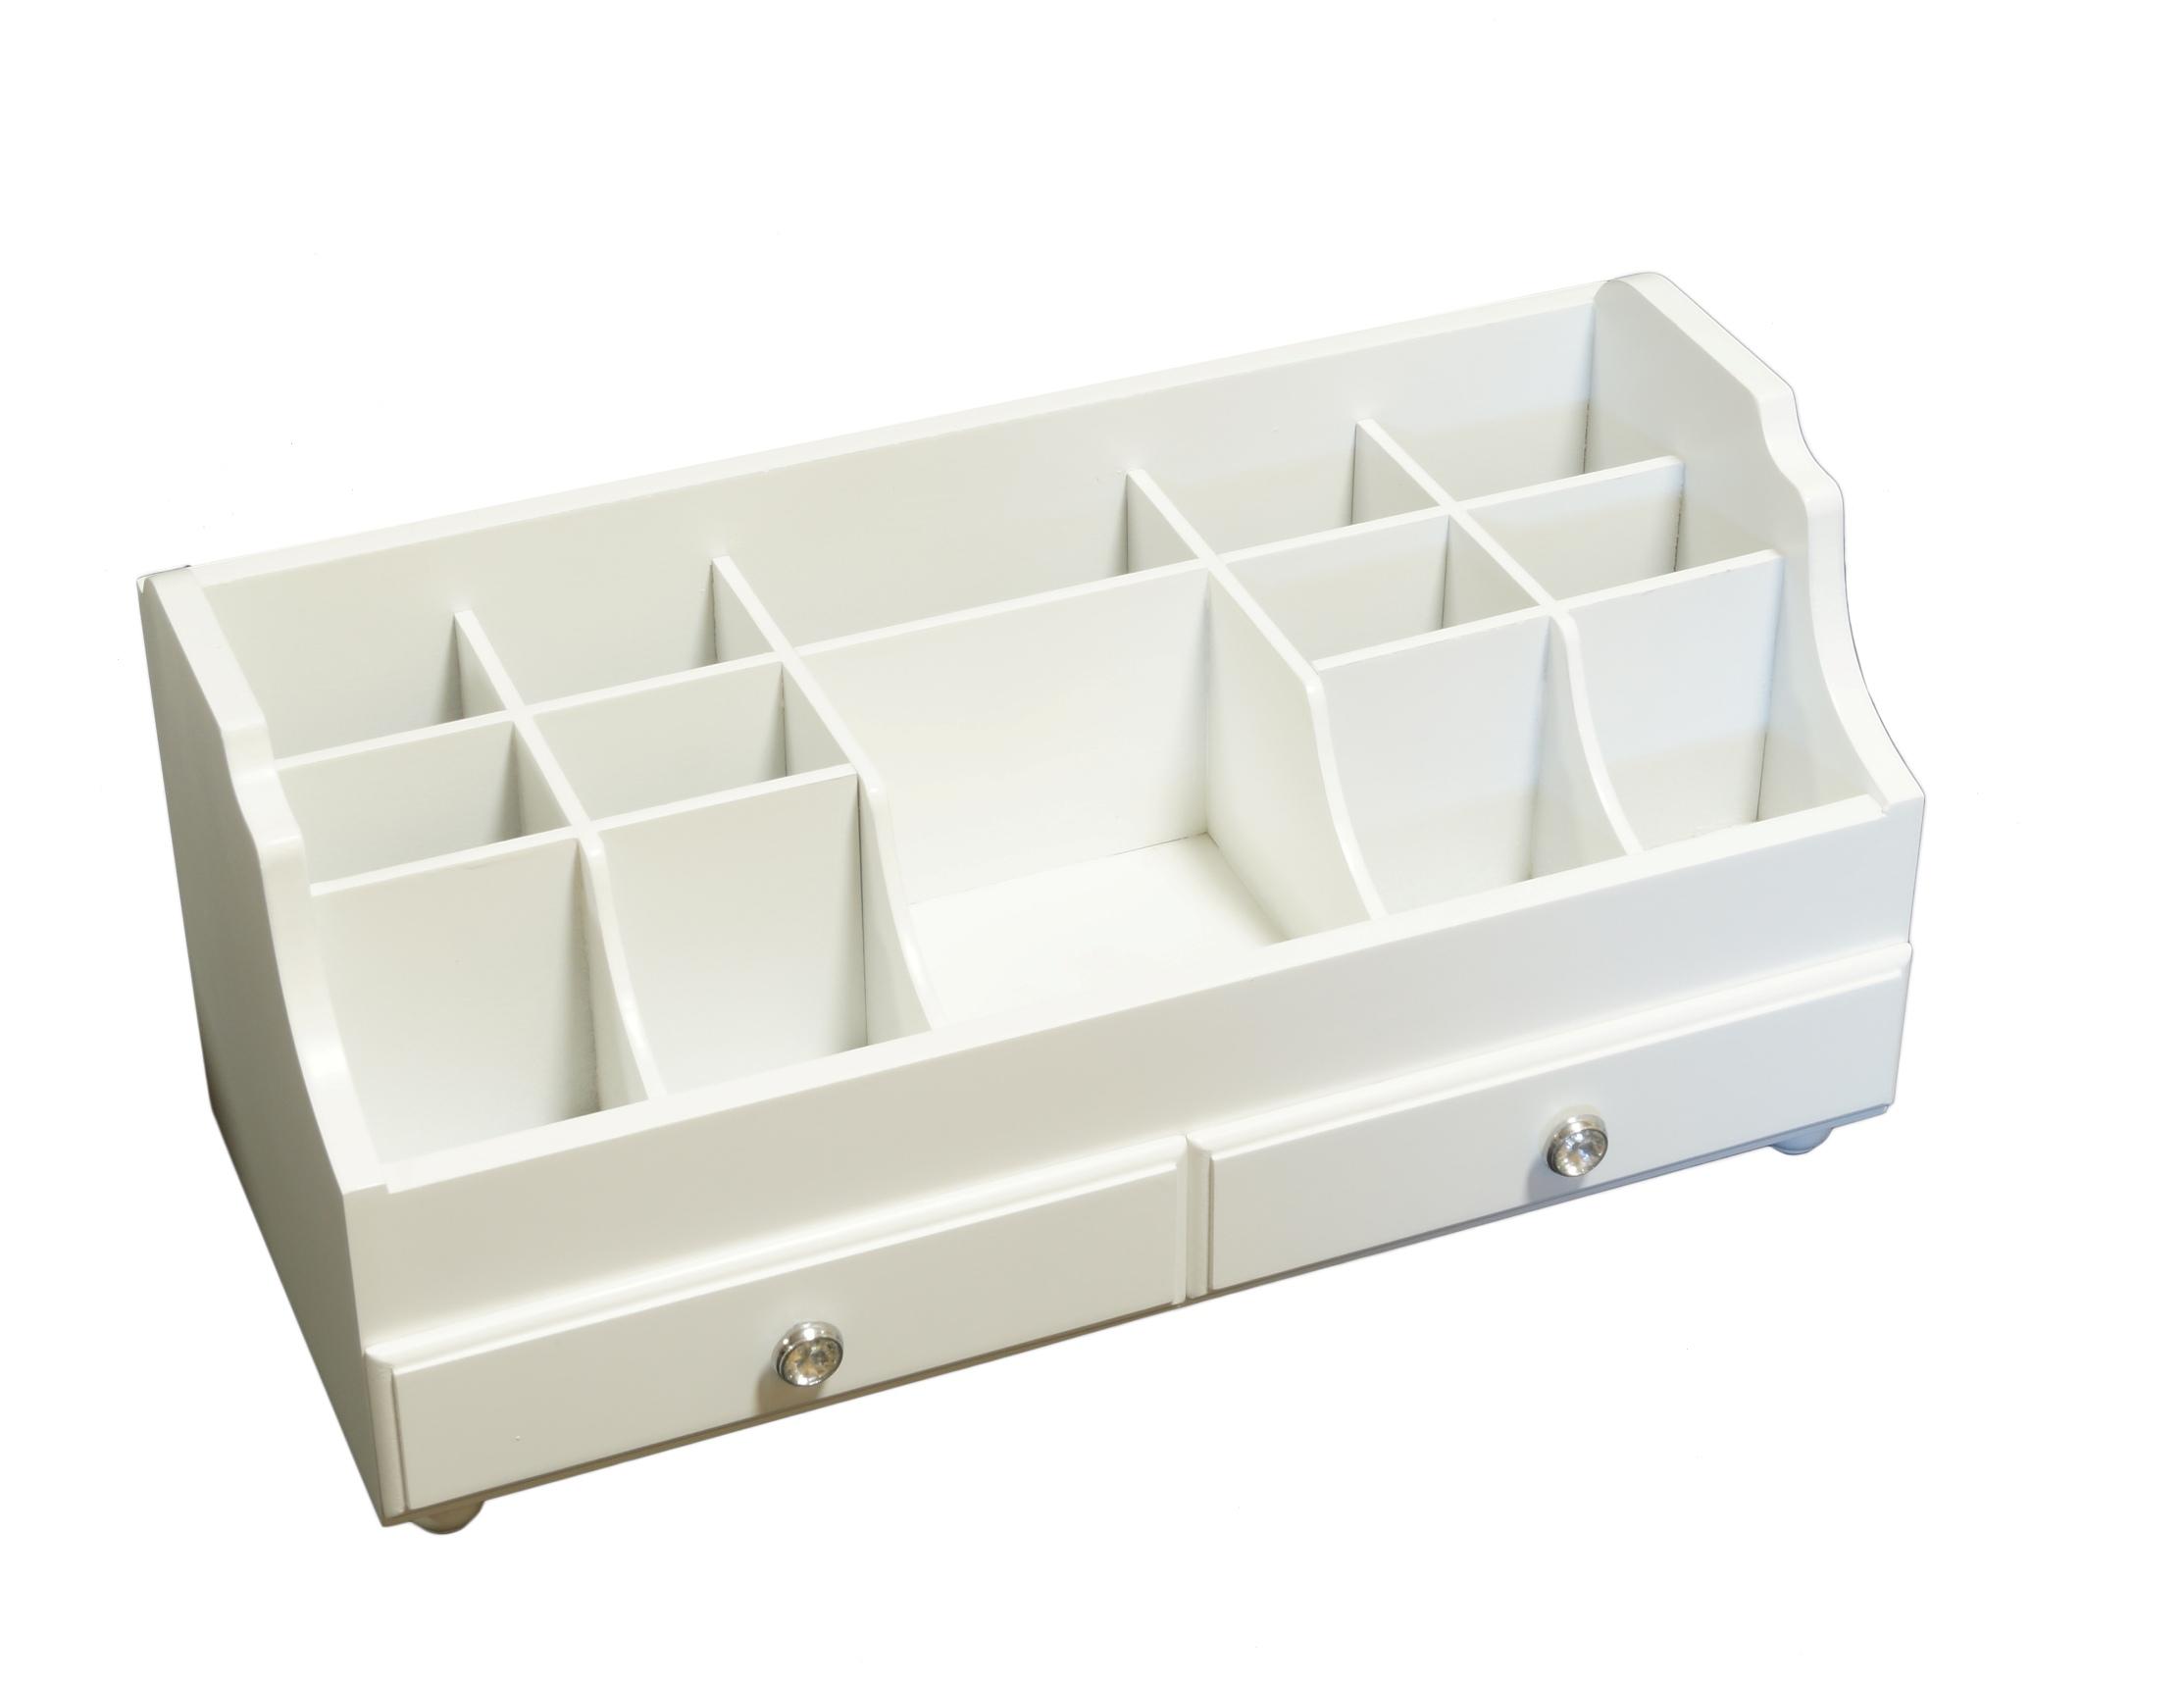 Šperky krabice biele drevo retro